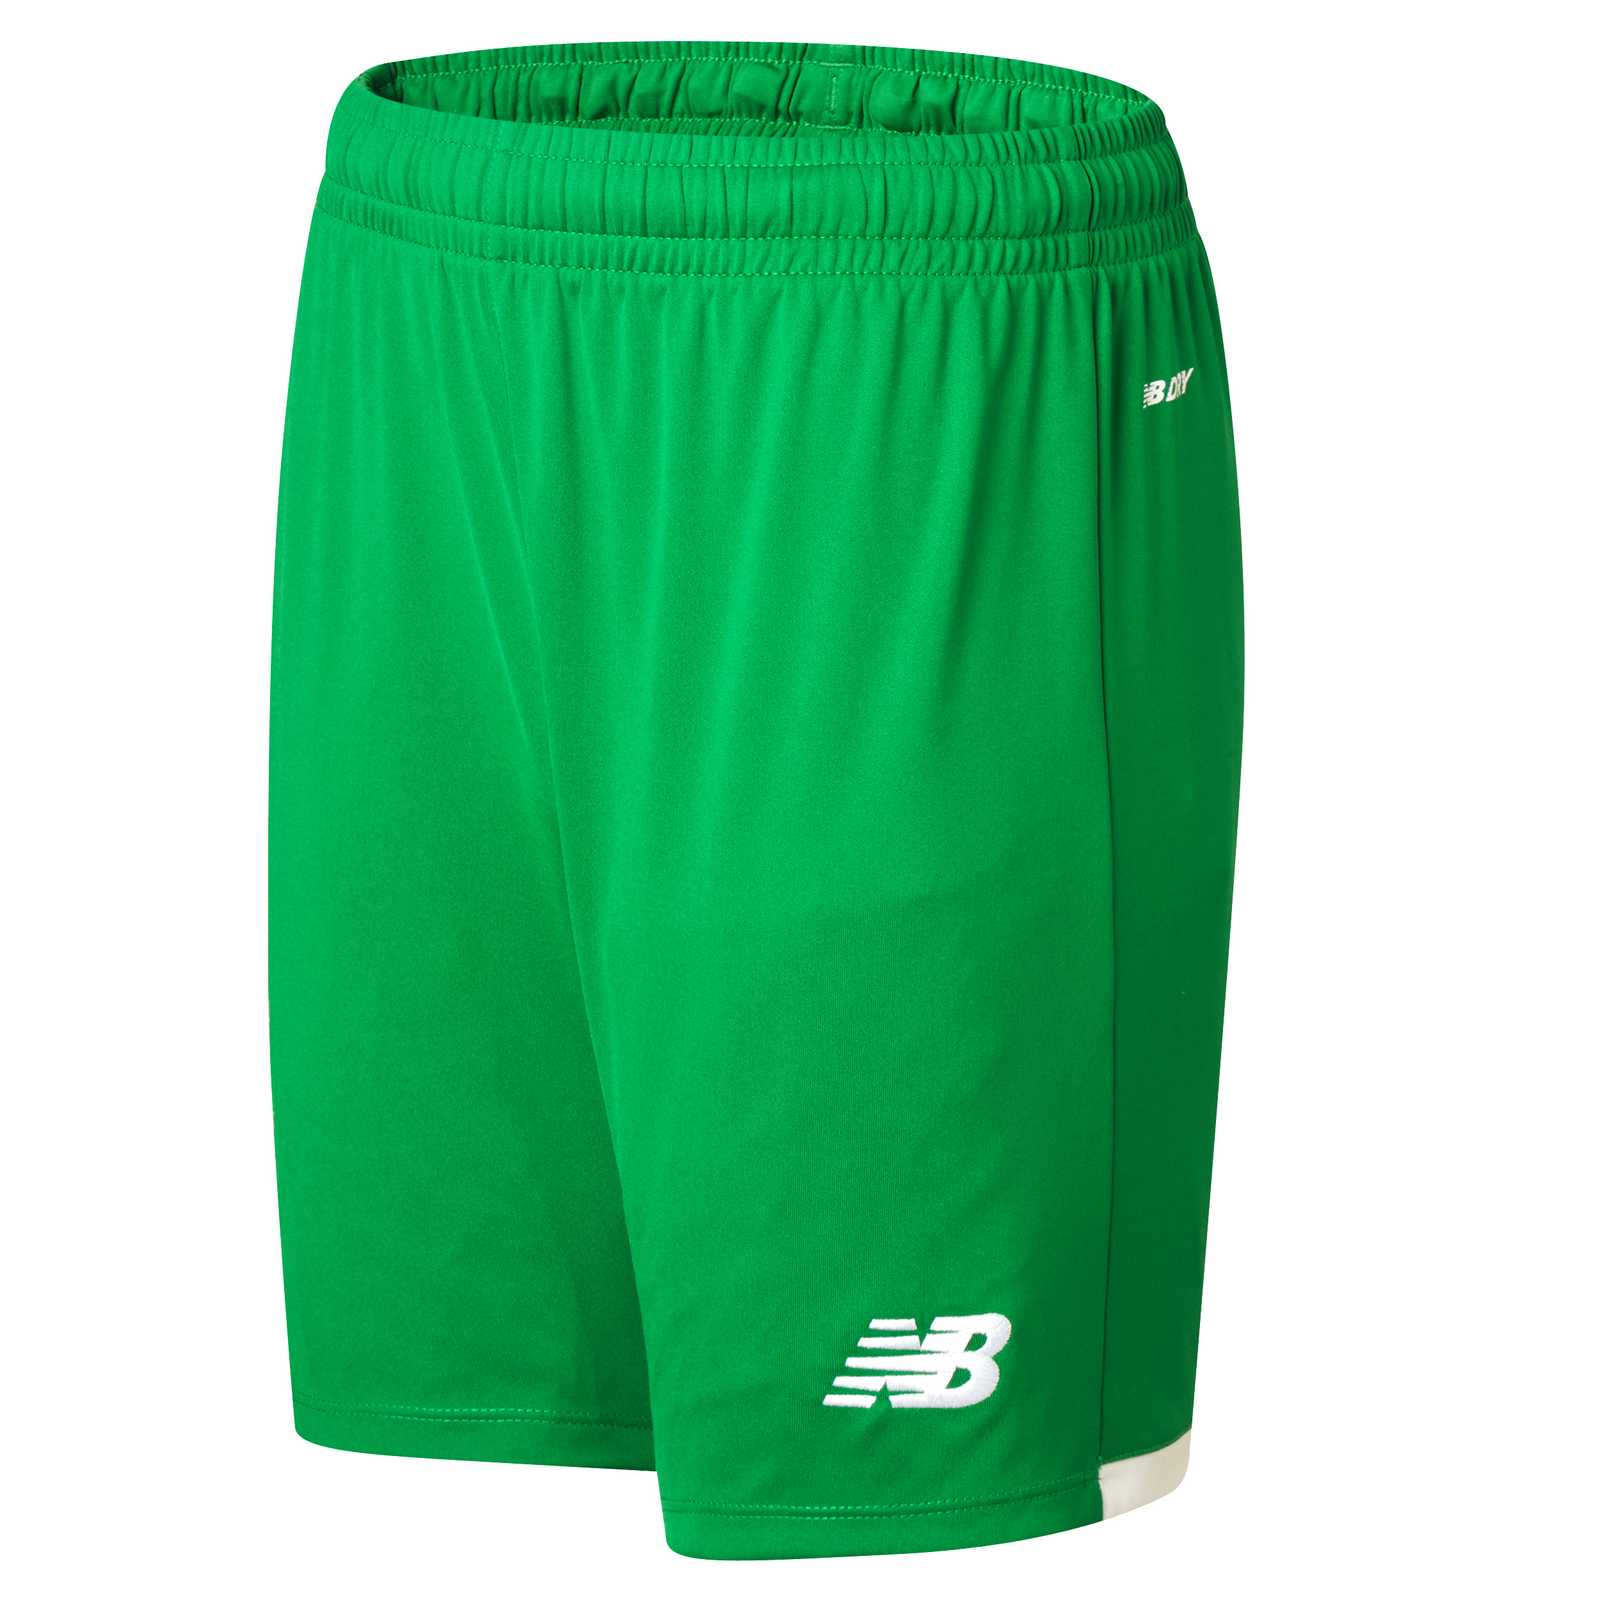 liverpool-17-18-goalkeeper-kit-shorts